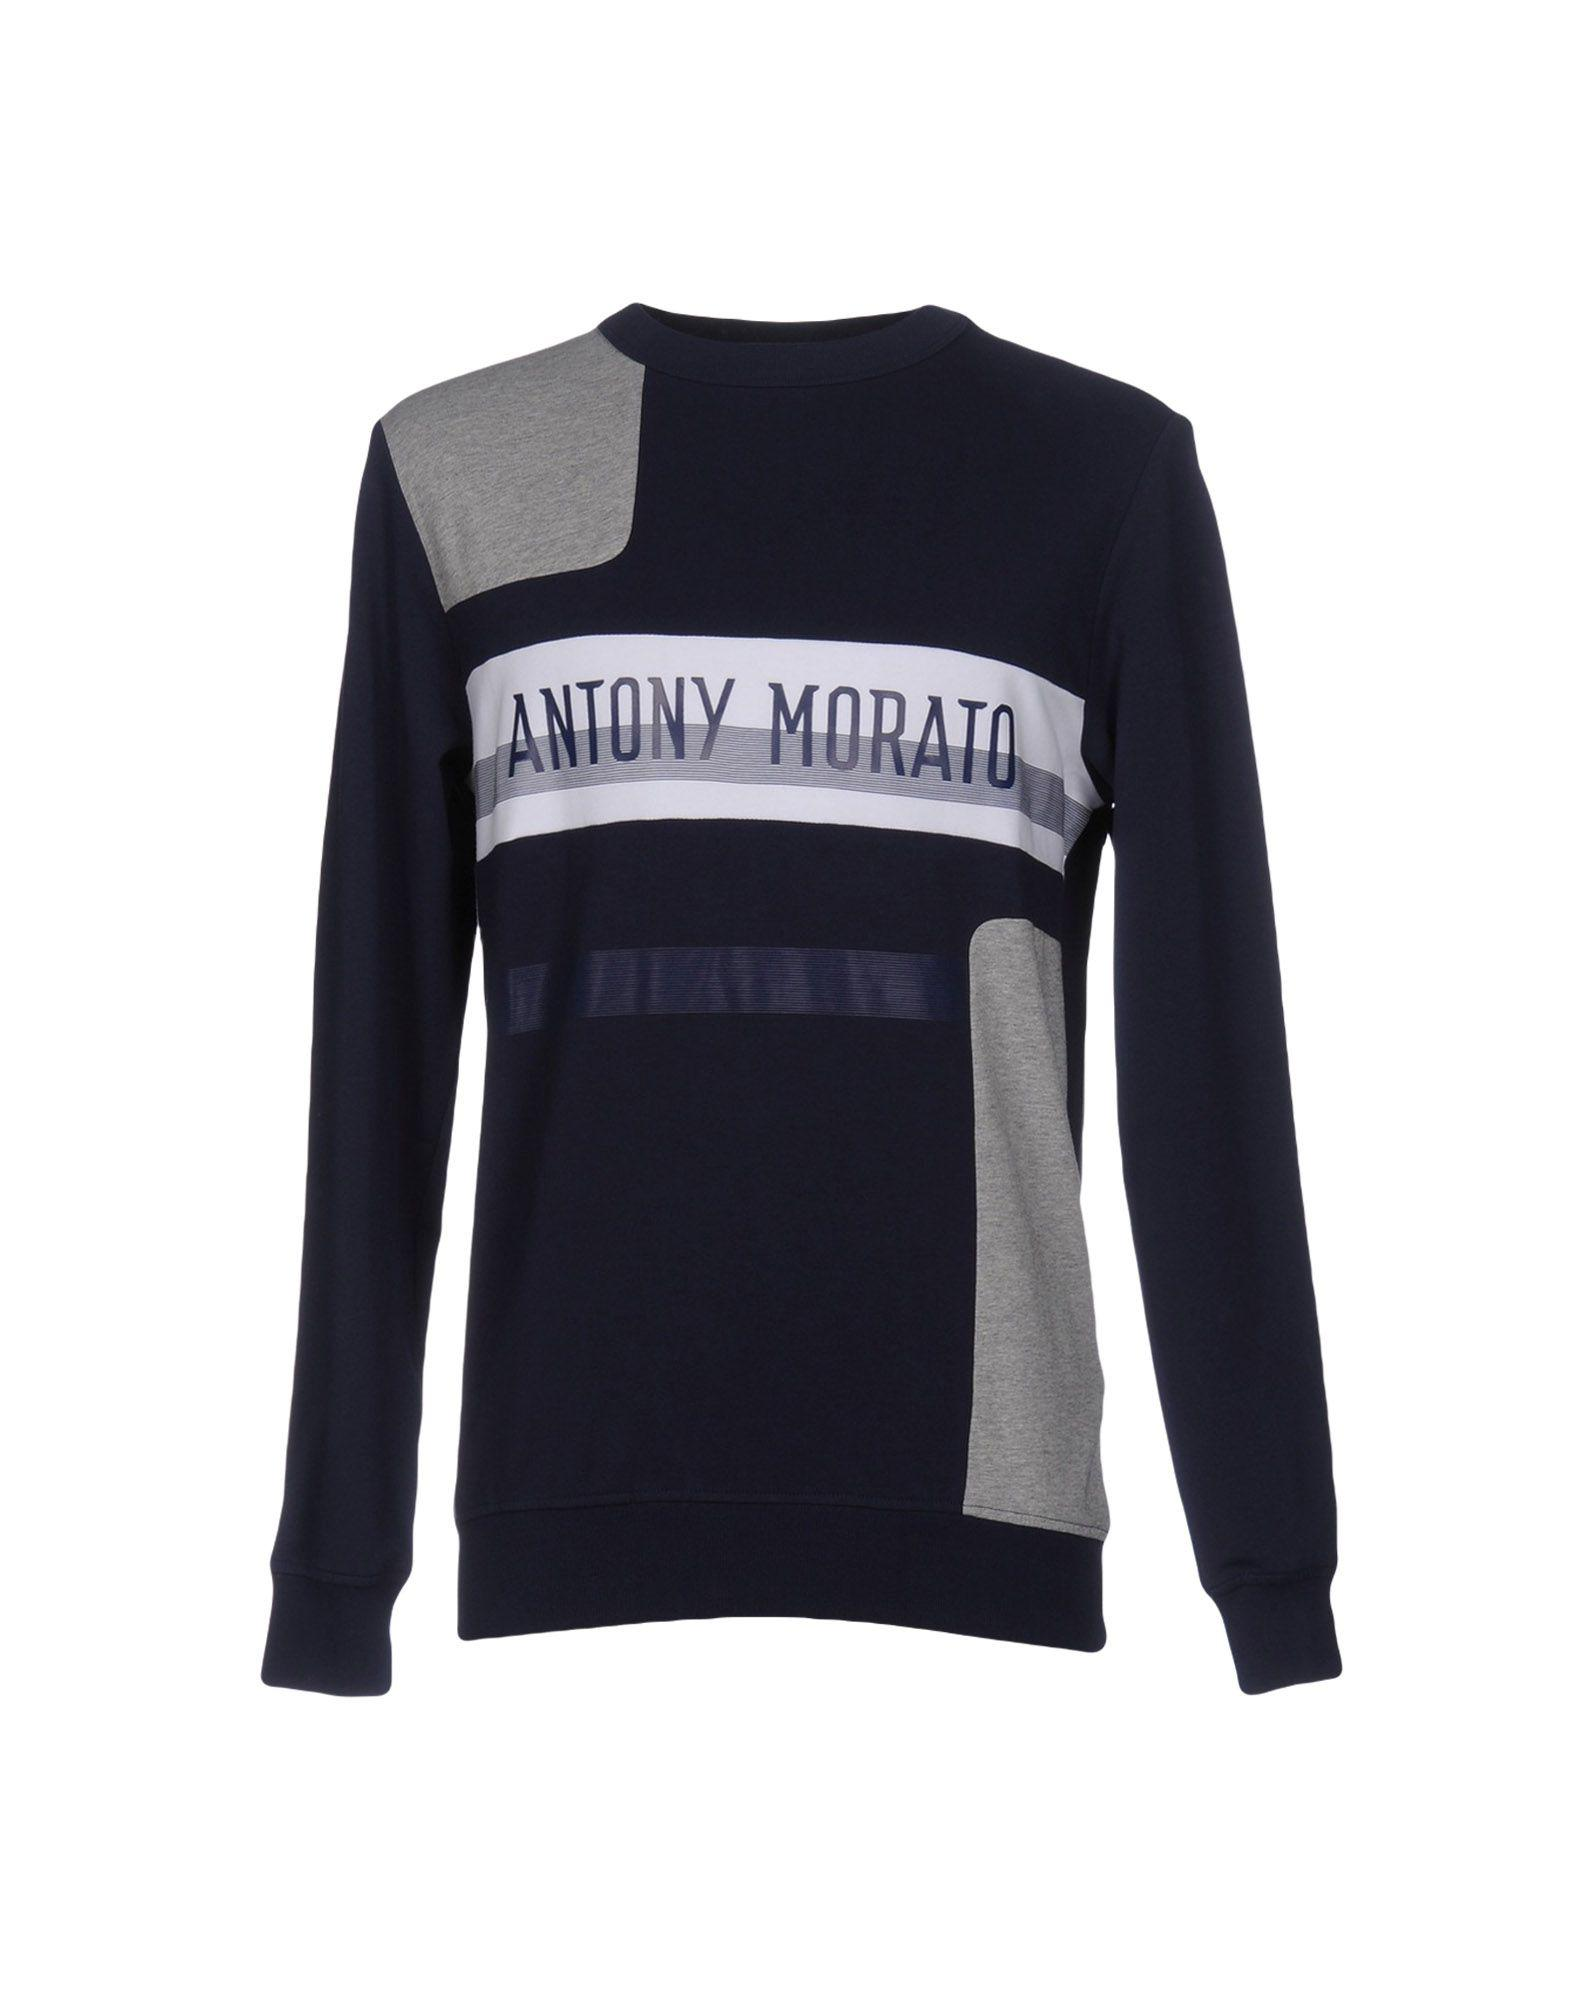 Antony Morato | Blue Sweatshirt for Men | Lyst. View Fullscreen